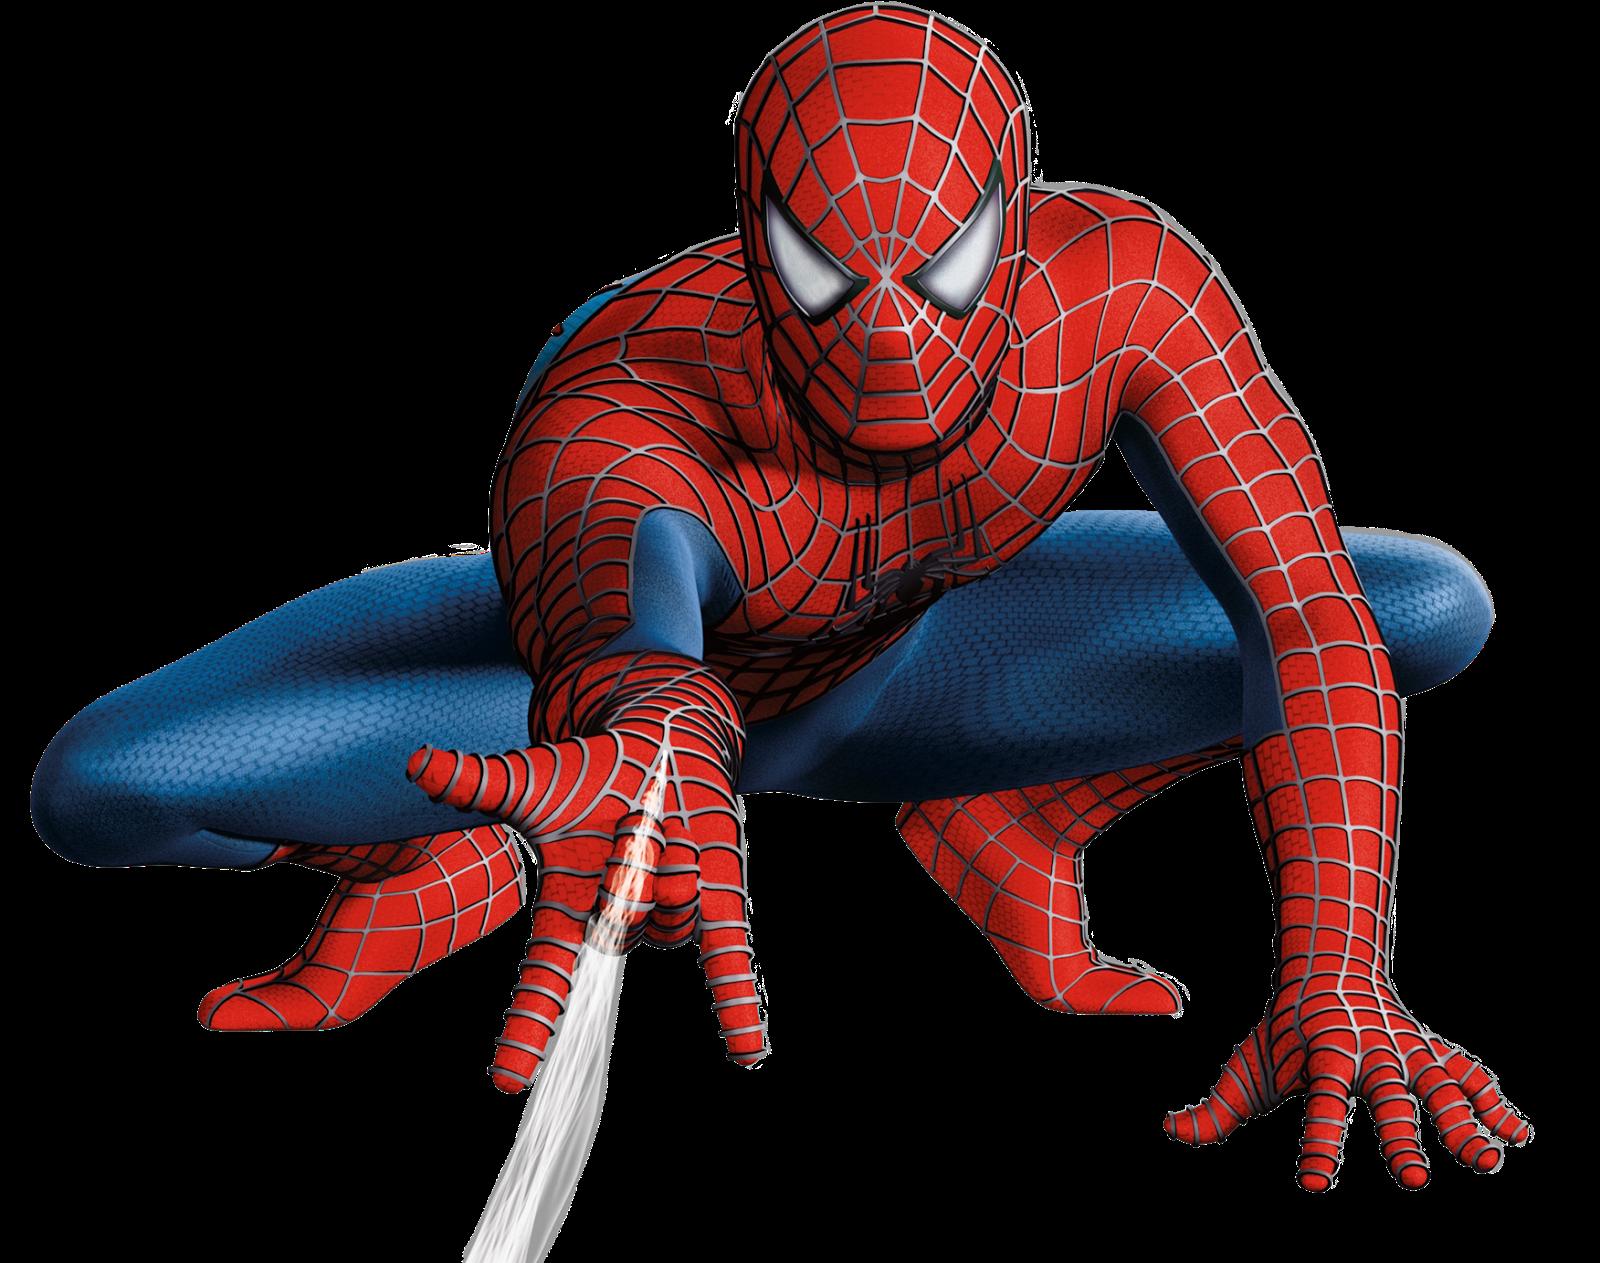 spiderman3earth - Google Sites